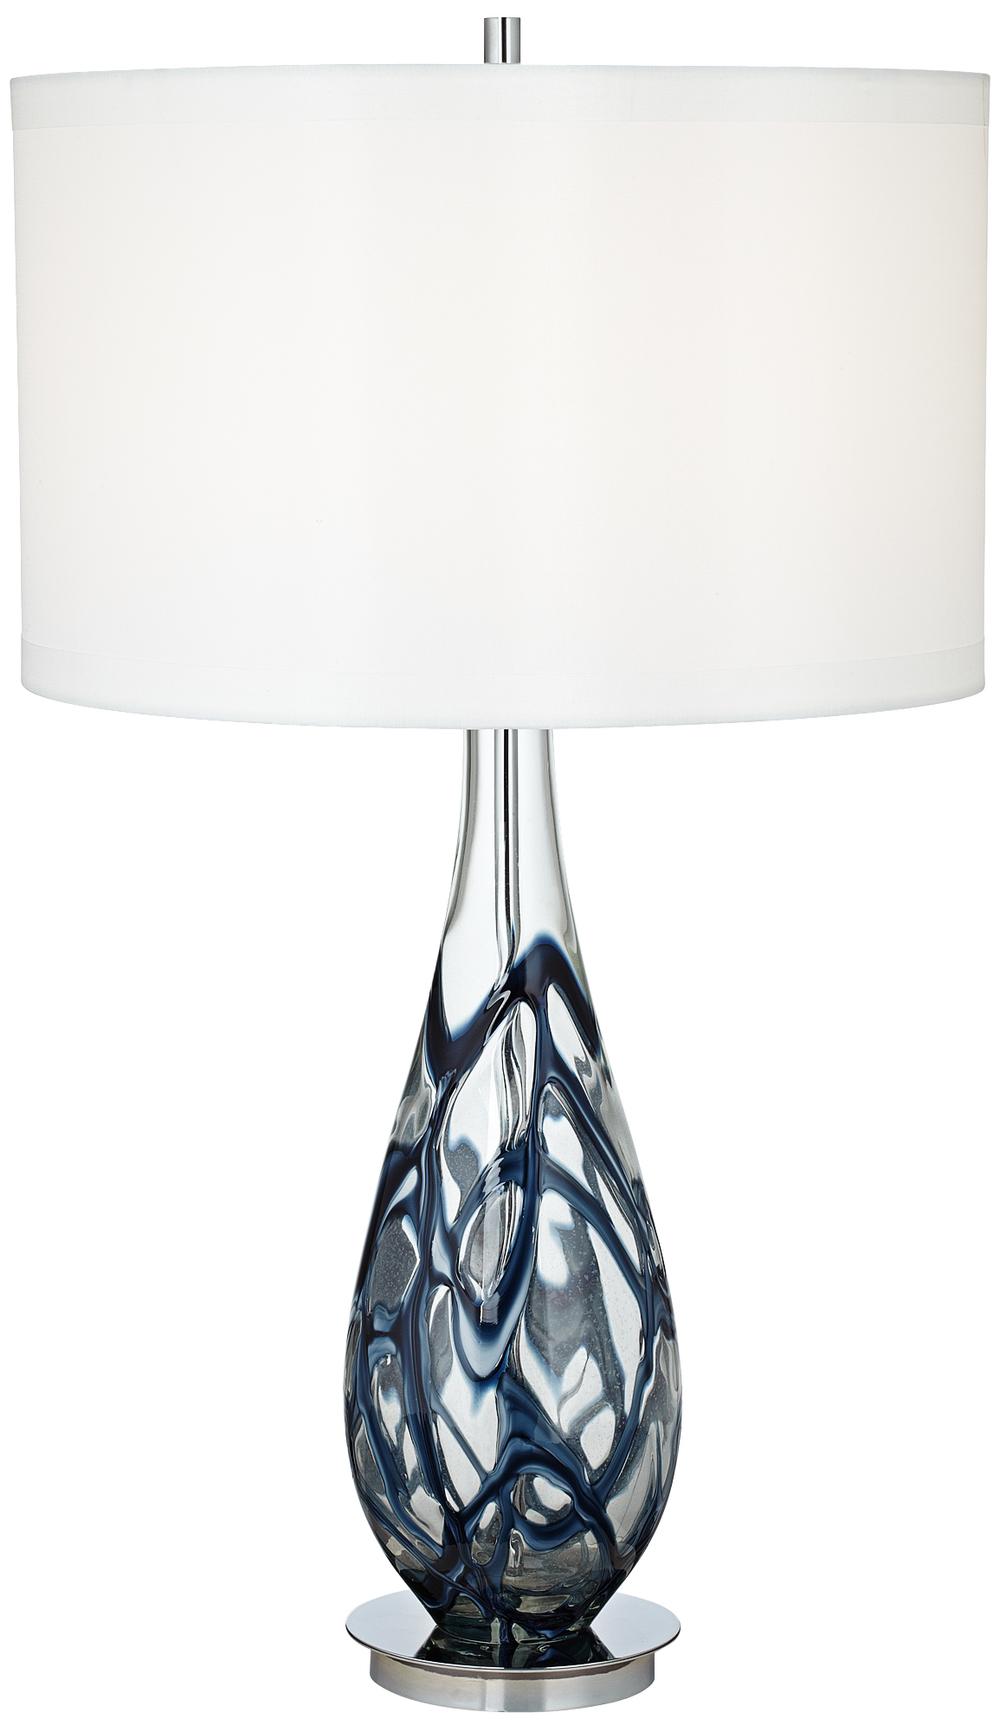 Pacific Coast Lighting - Indigo Swirl Art Glass Table Lamp